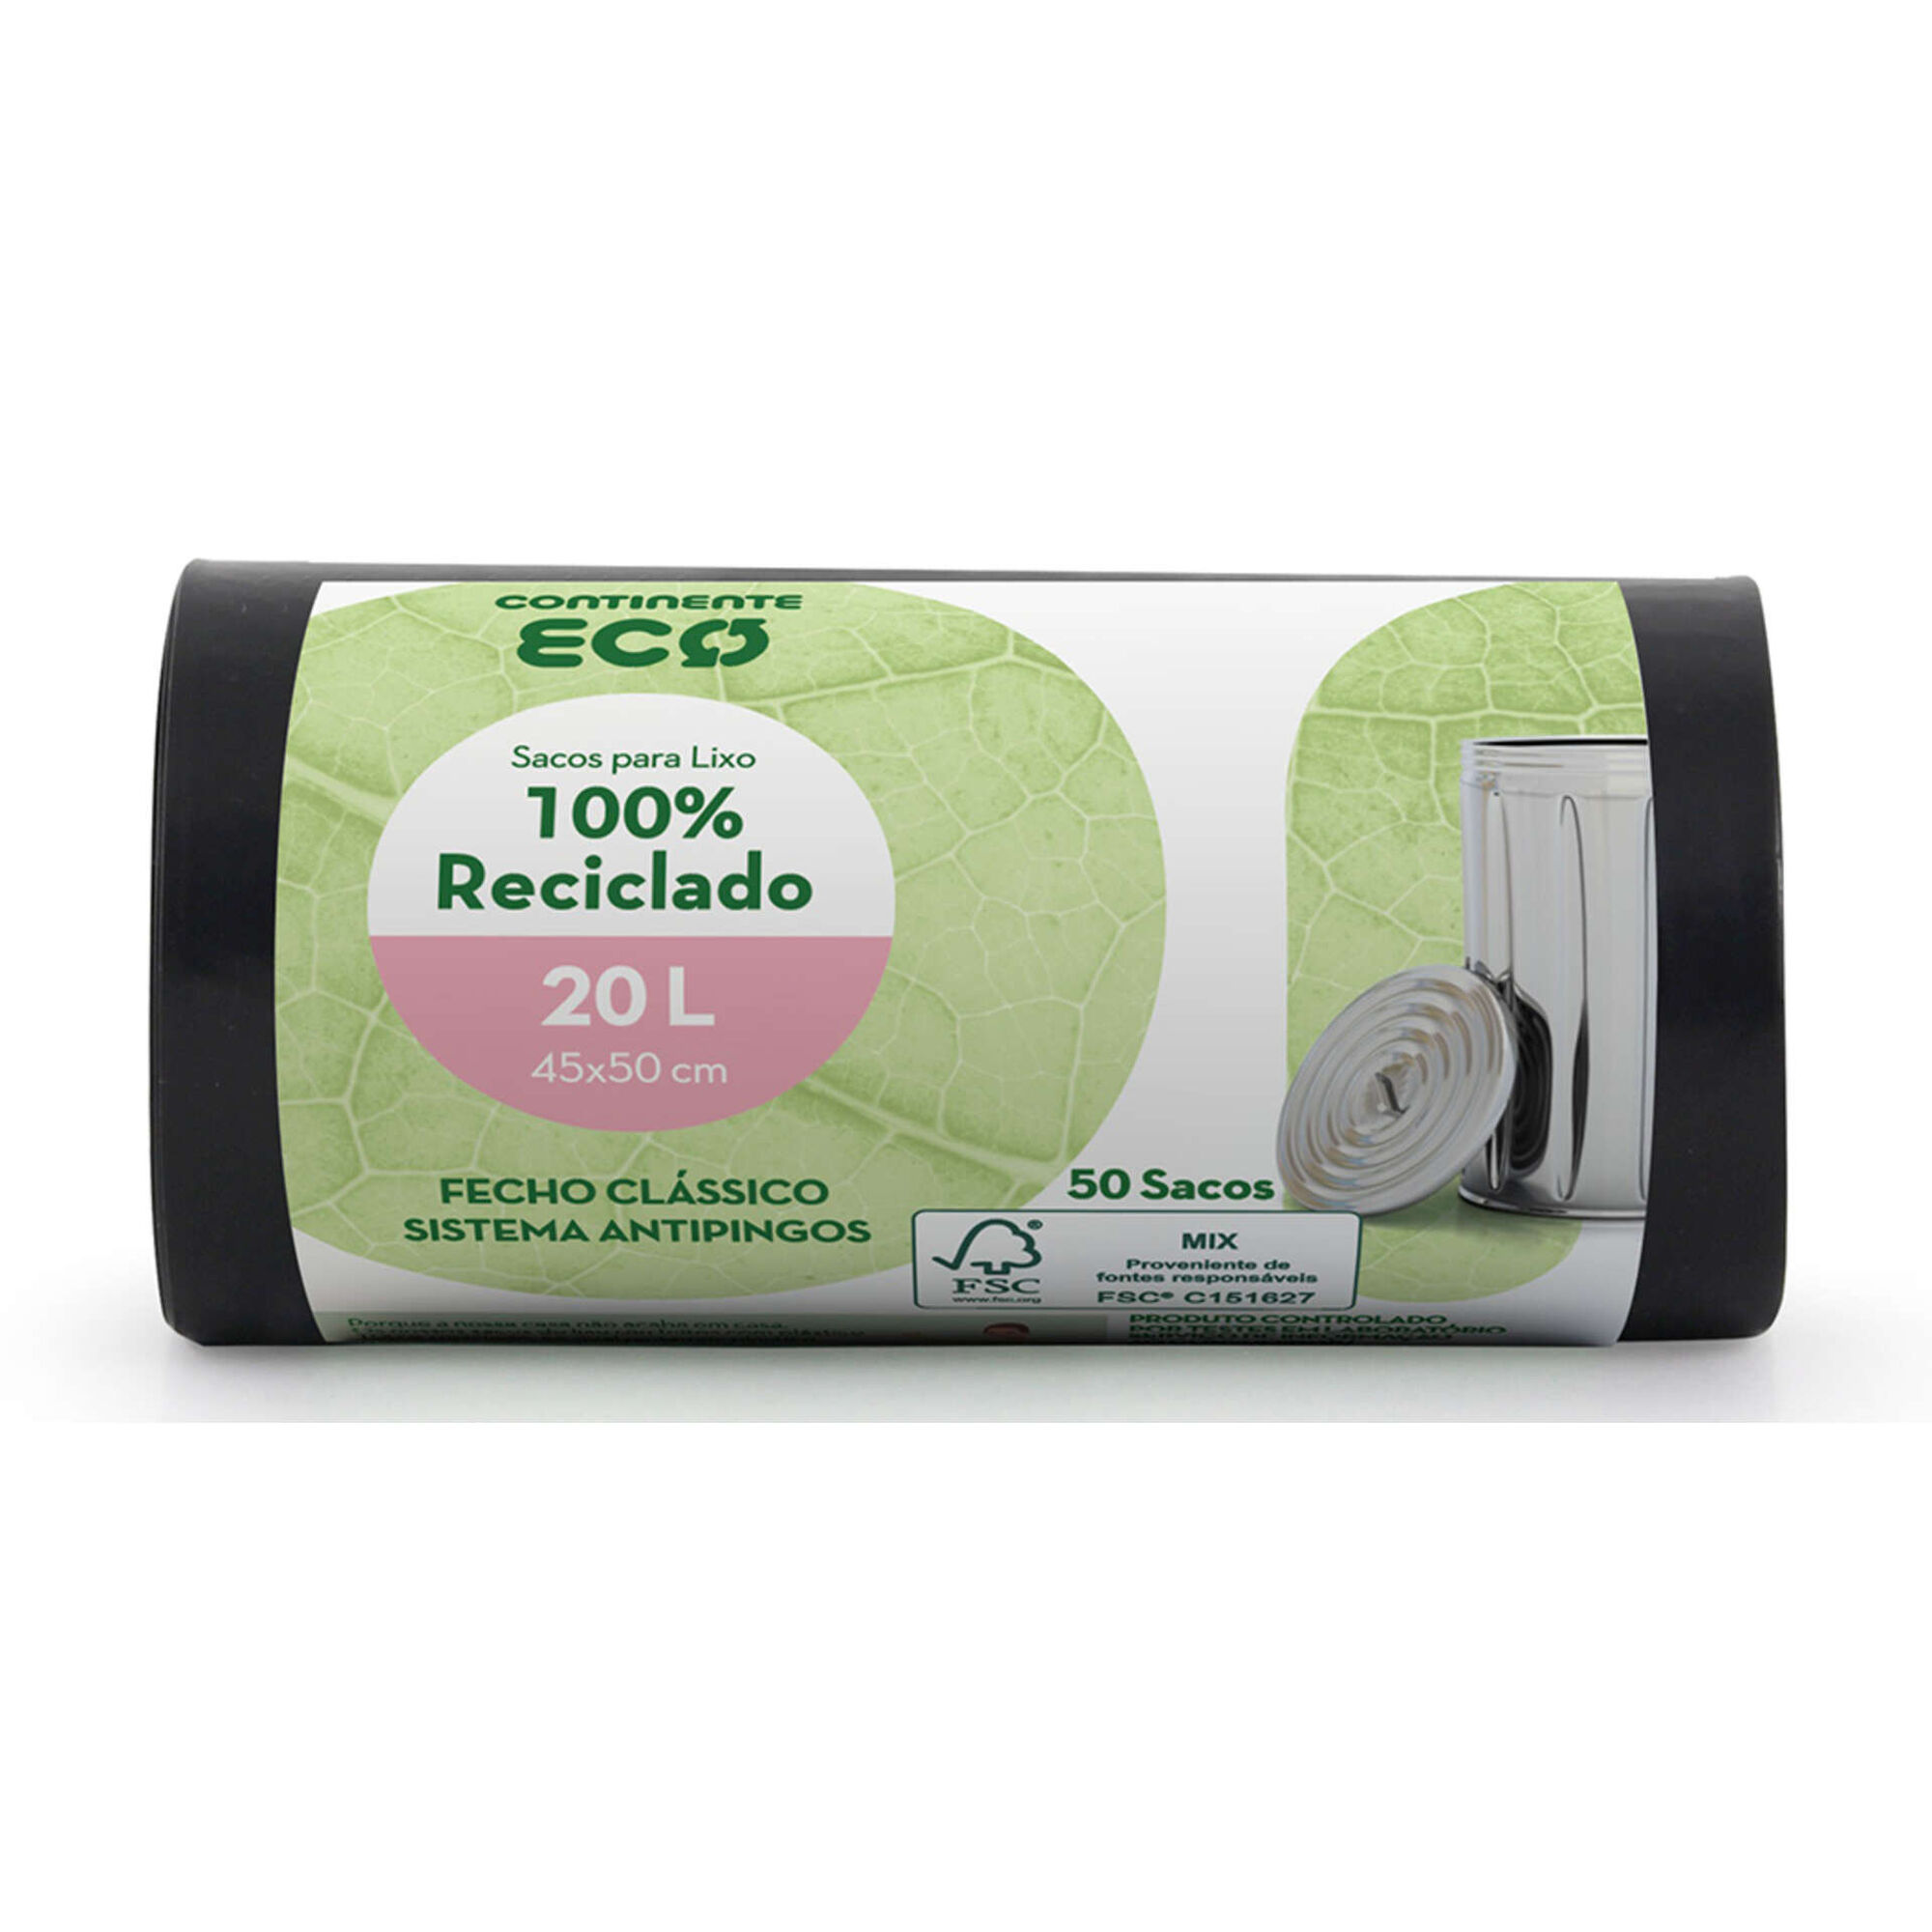 Sacos Lixo 100% Reciclado Fecho Clássico 20 lt